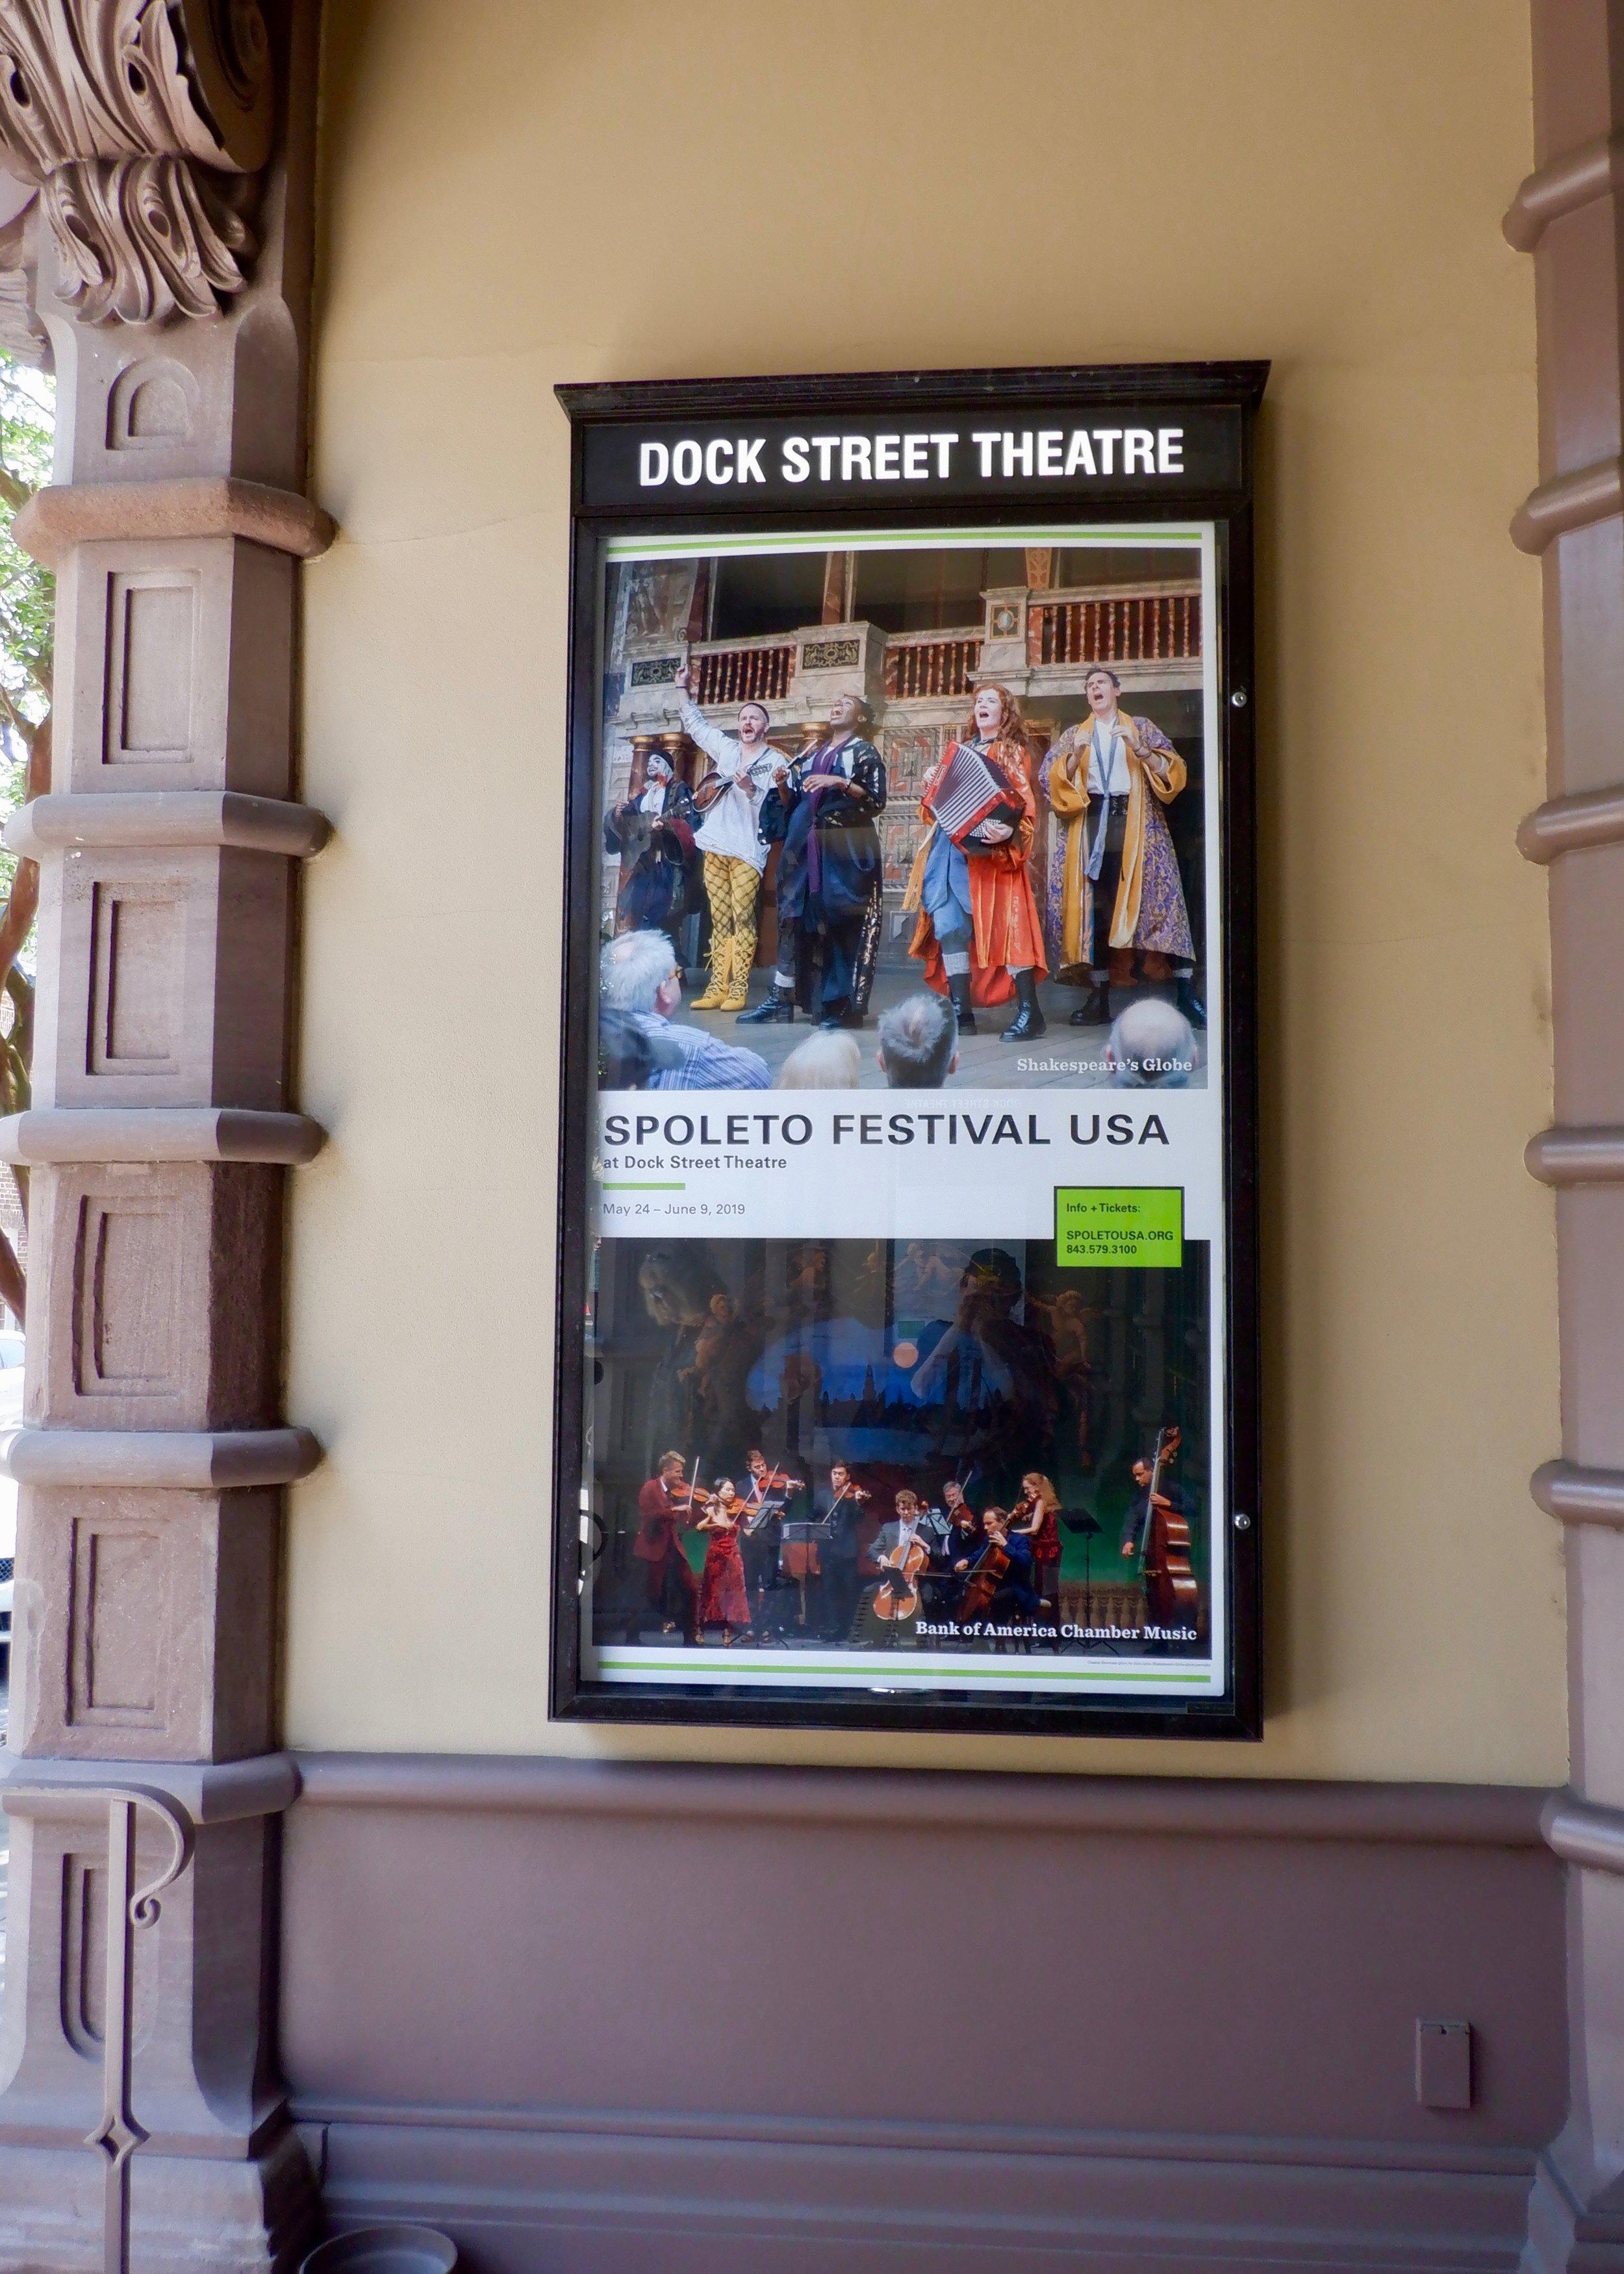 Dock Street Theatre Chamber Music.jpg